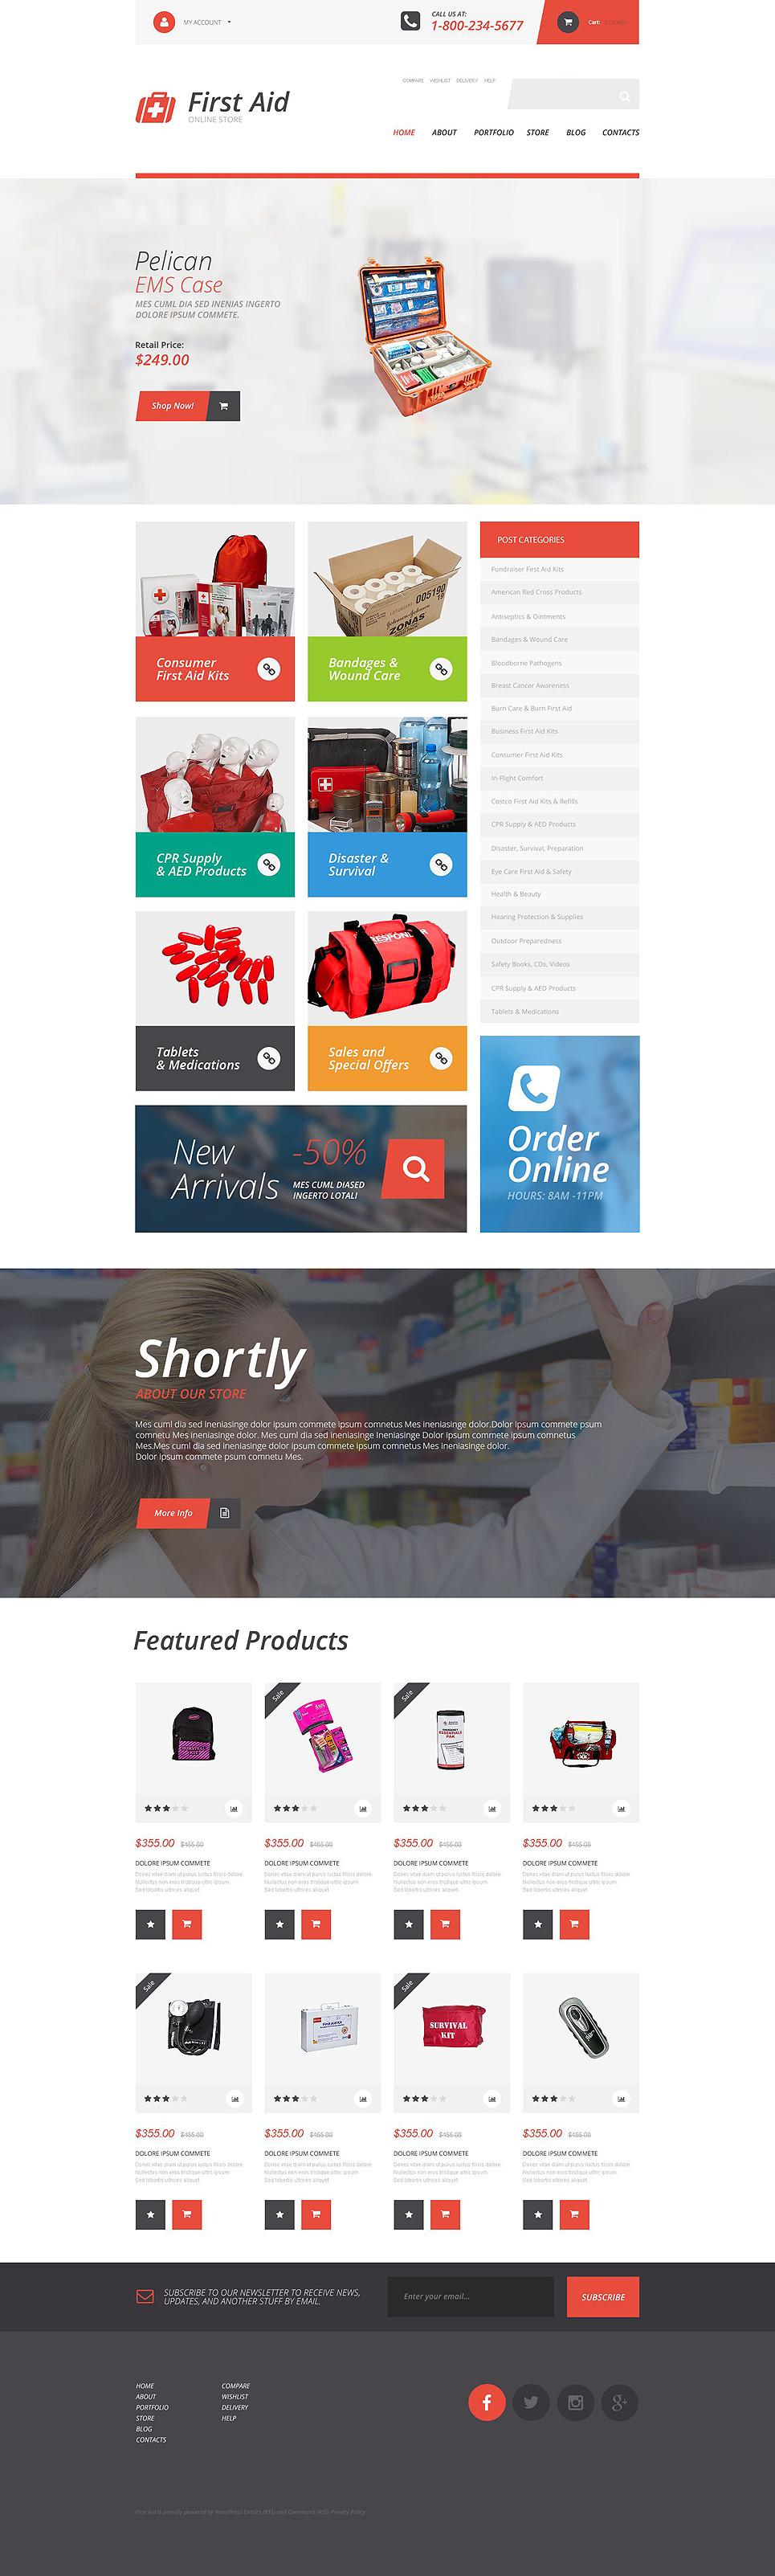 First Aid Supplies WooCommerce Theme New Screenshots BIG